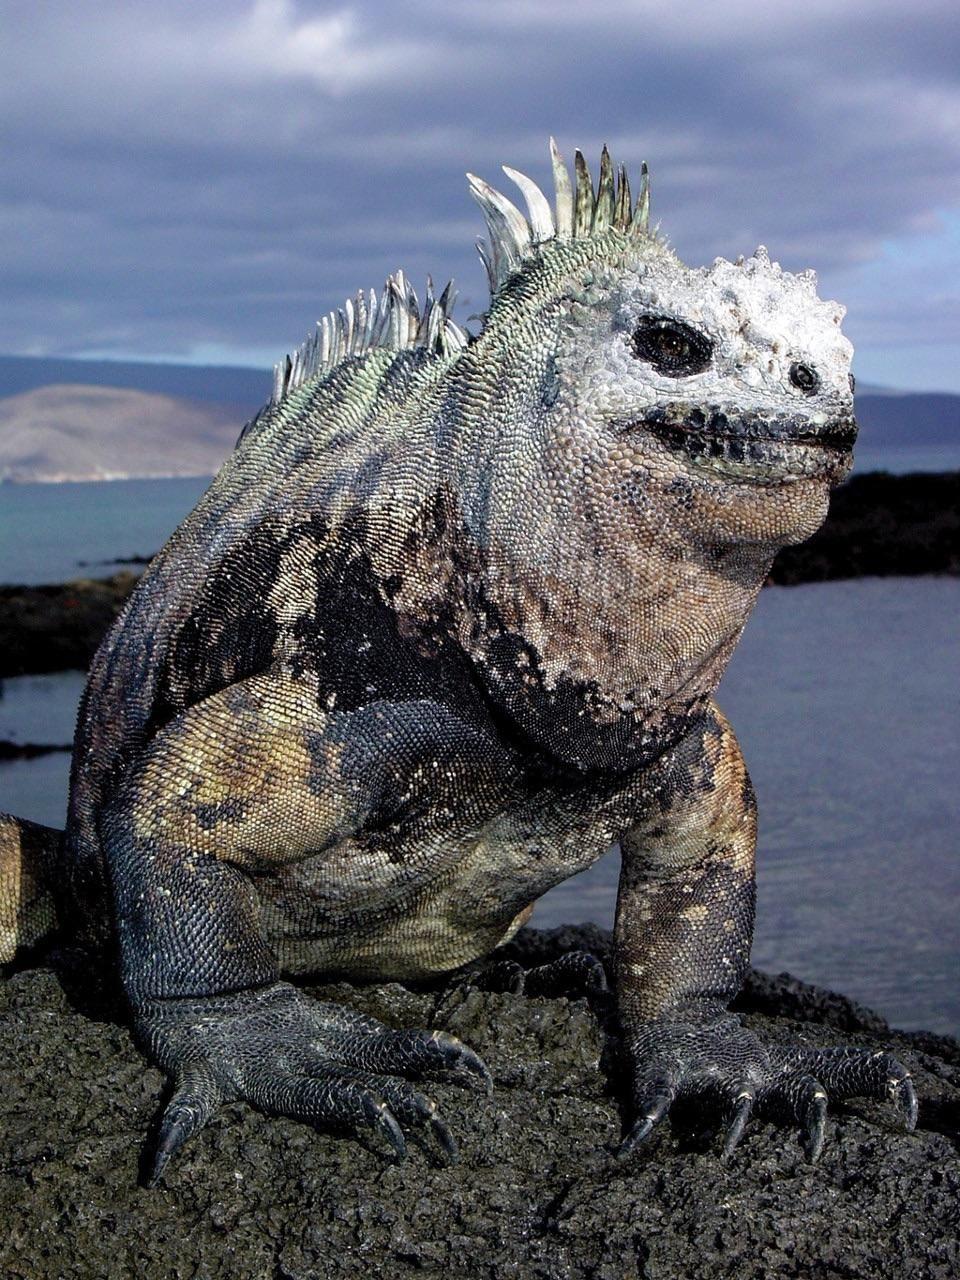 Image result for marine iguana | Nature | Pinterest | Creatures